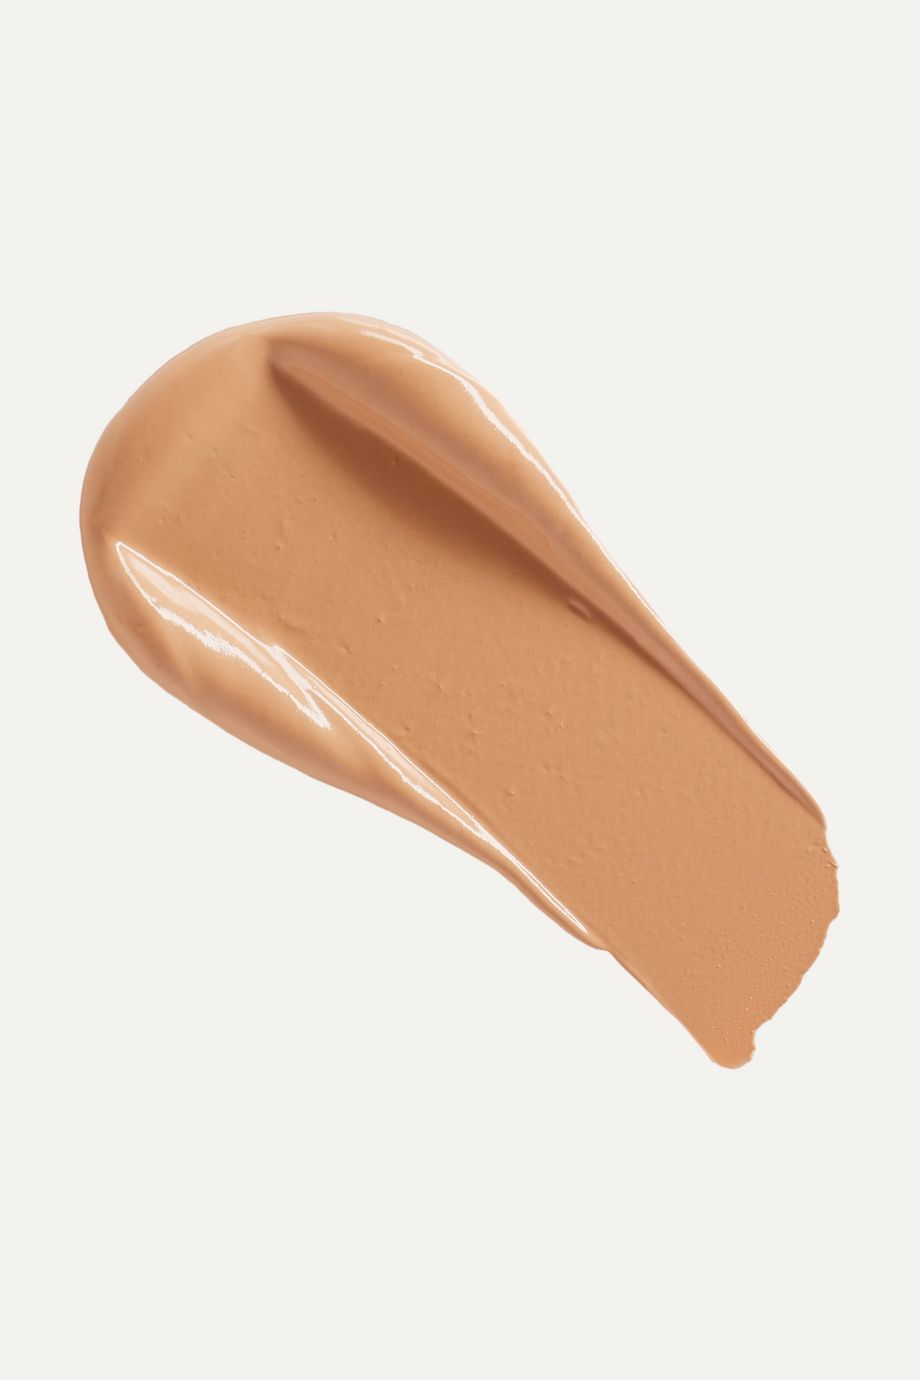 Illamasqua Stylo correcteur Skin Base, Medium 2